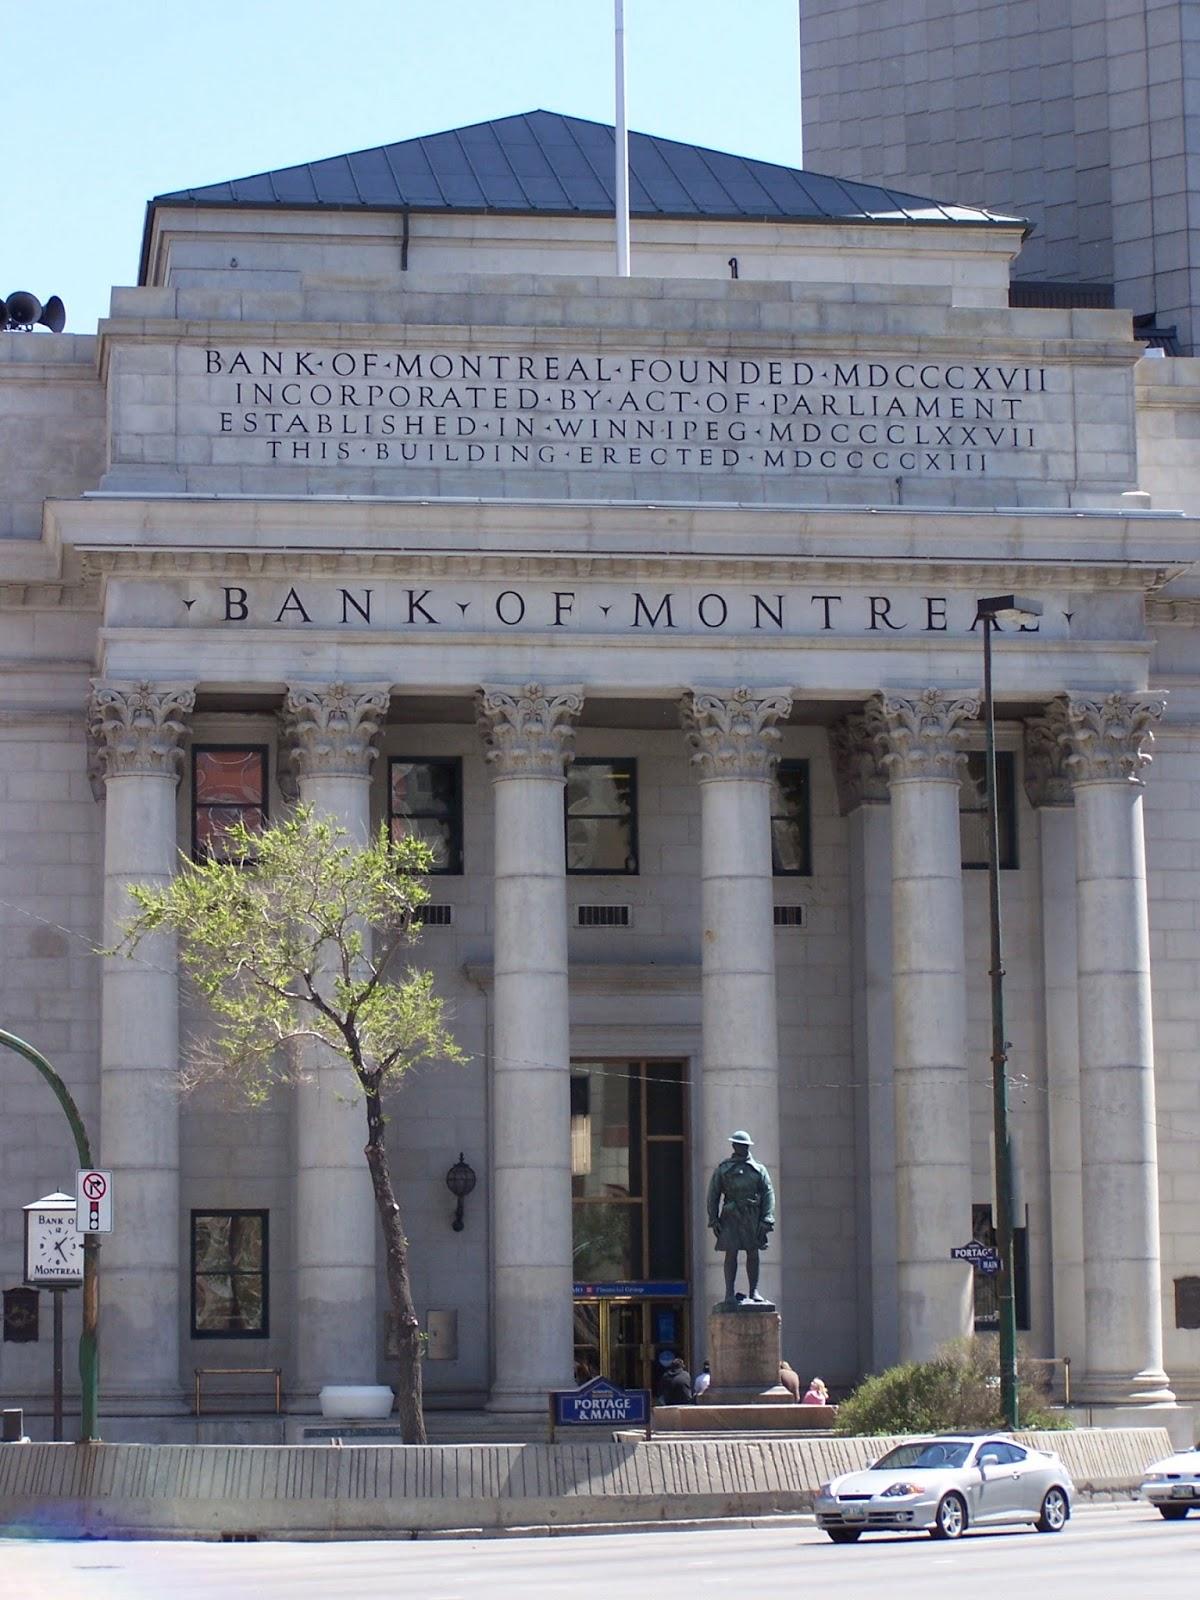 bank of montreal cambridge ontario